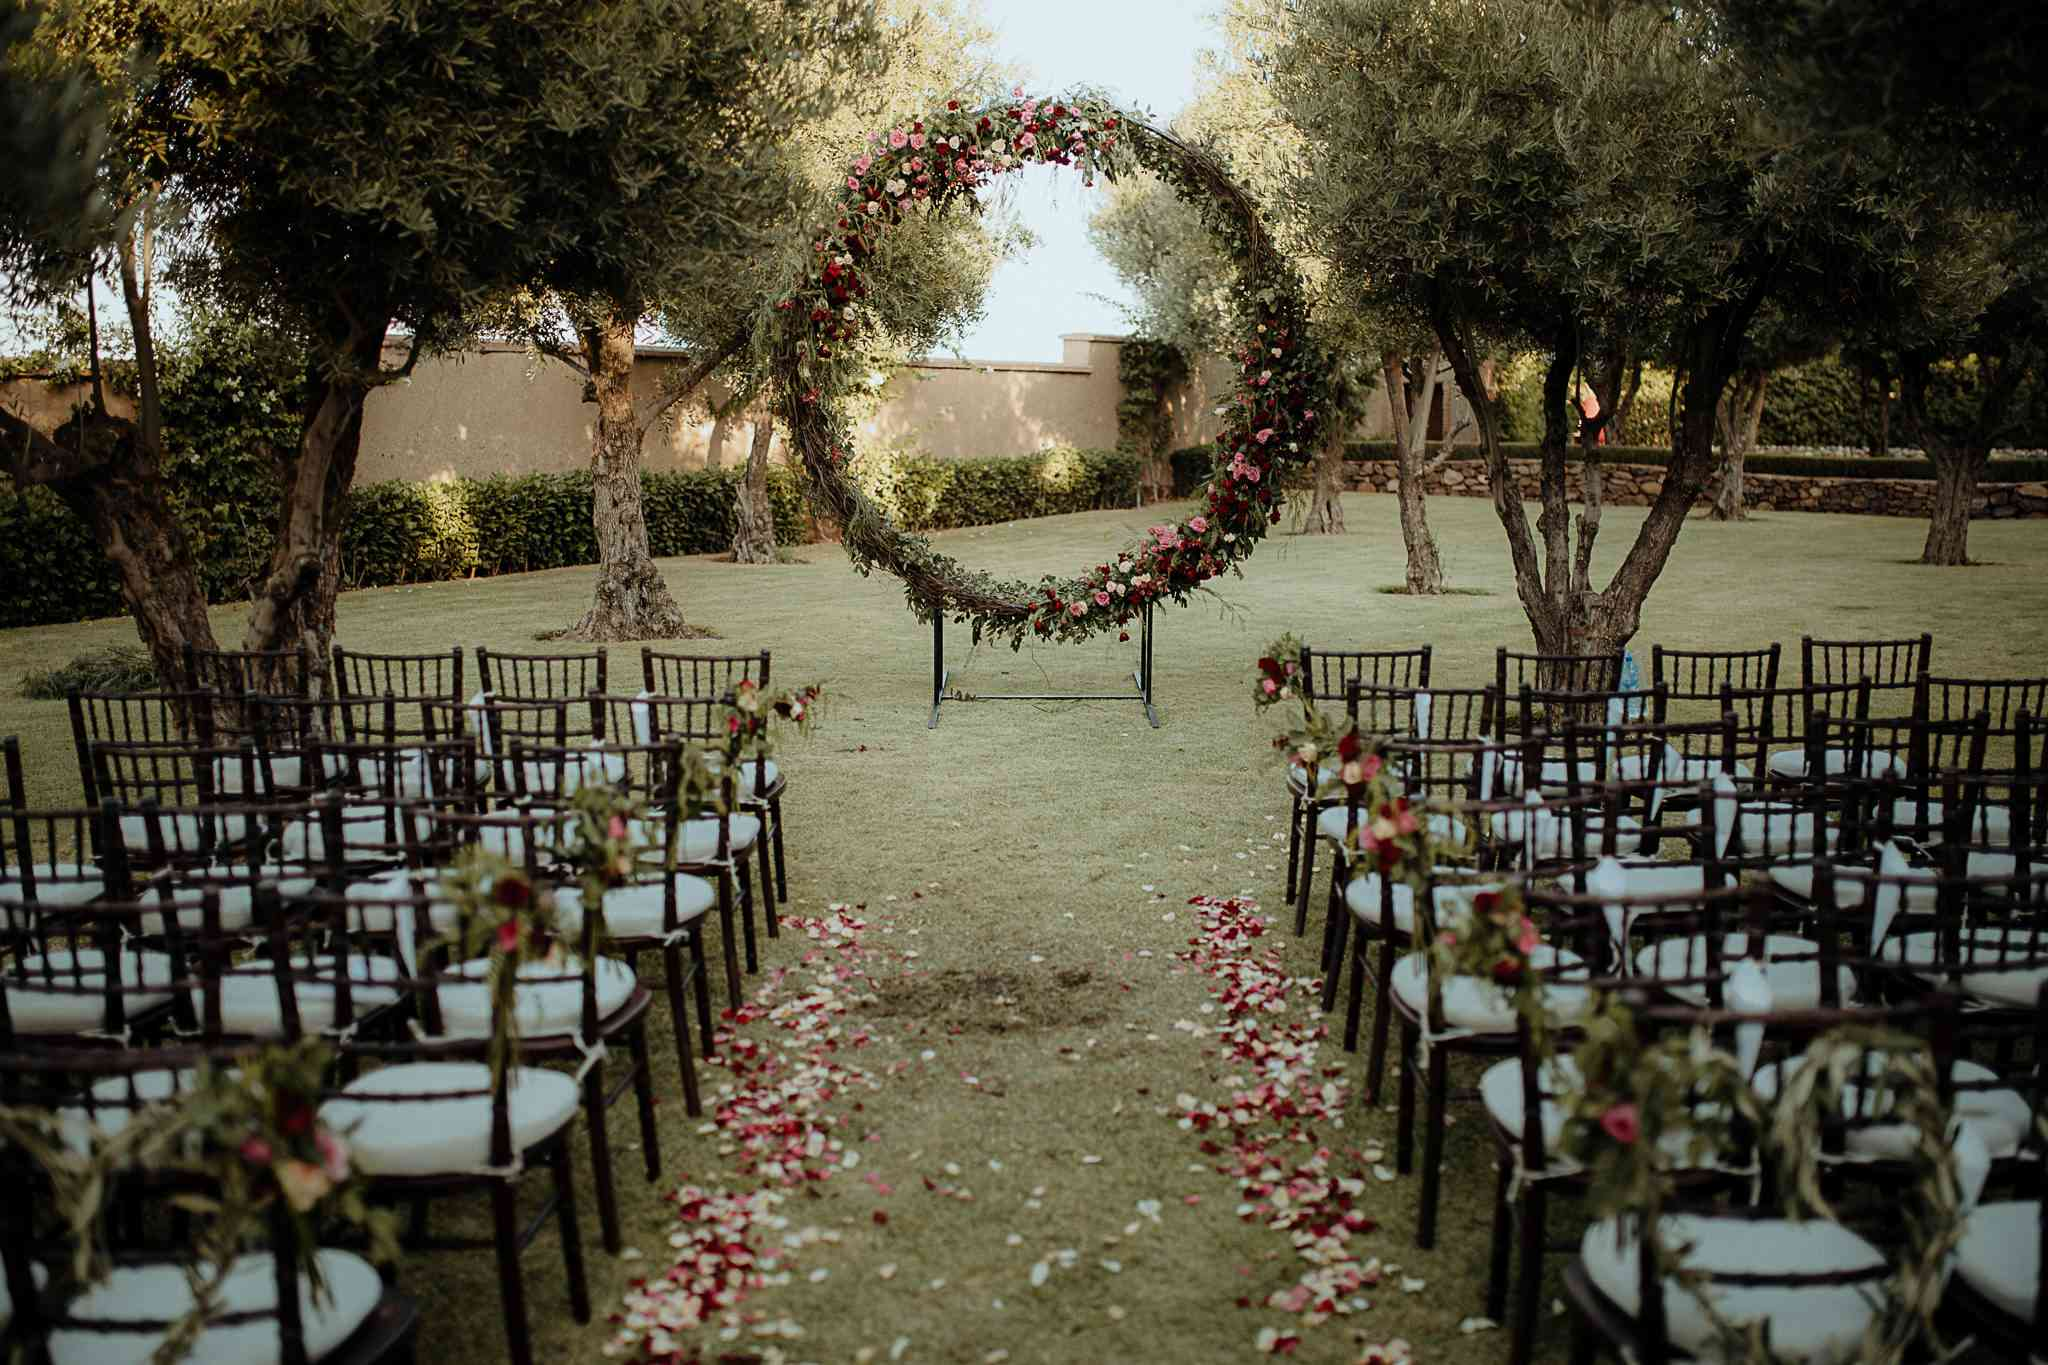 Moroccan wedding with circular arch